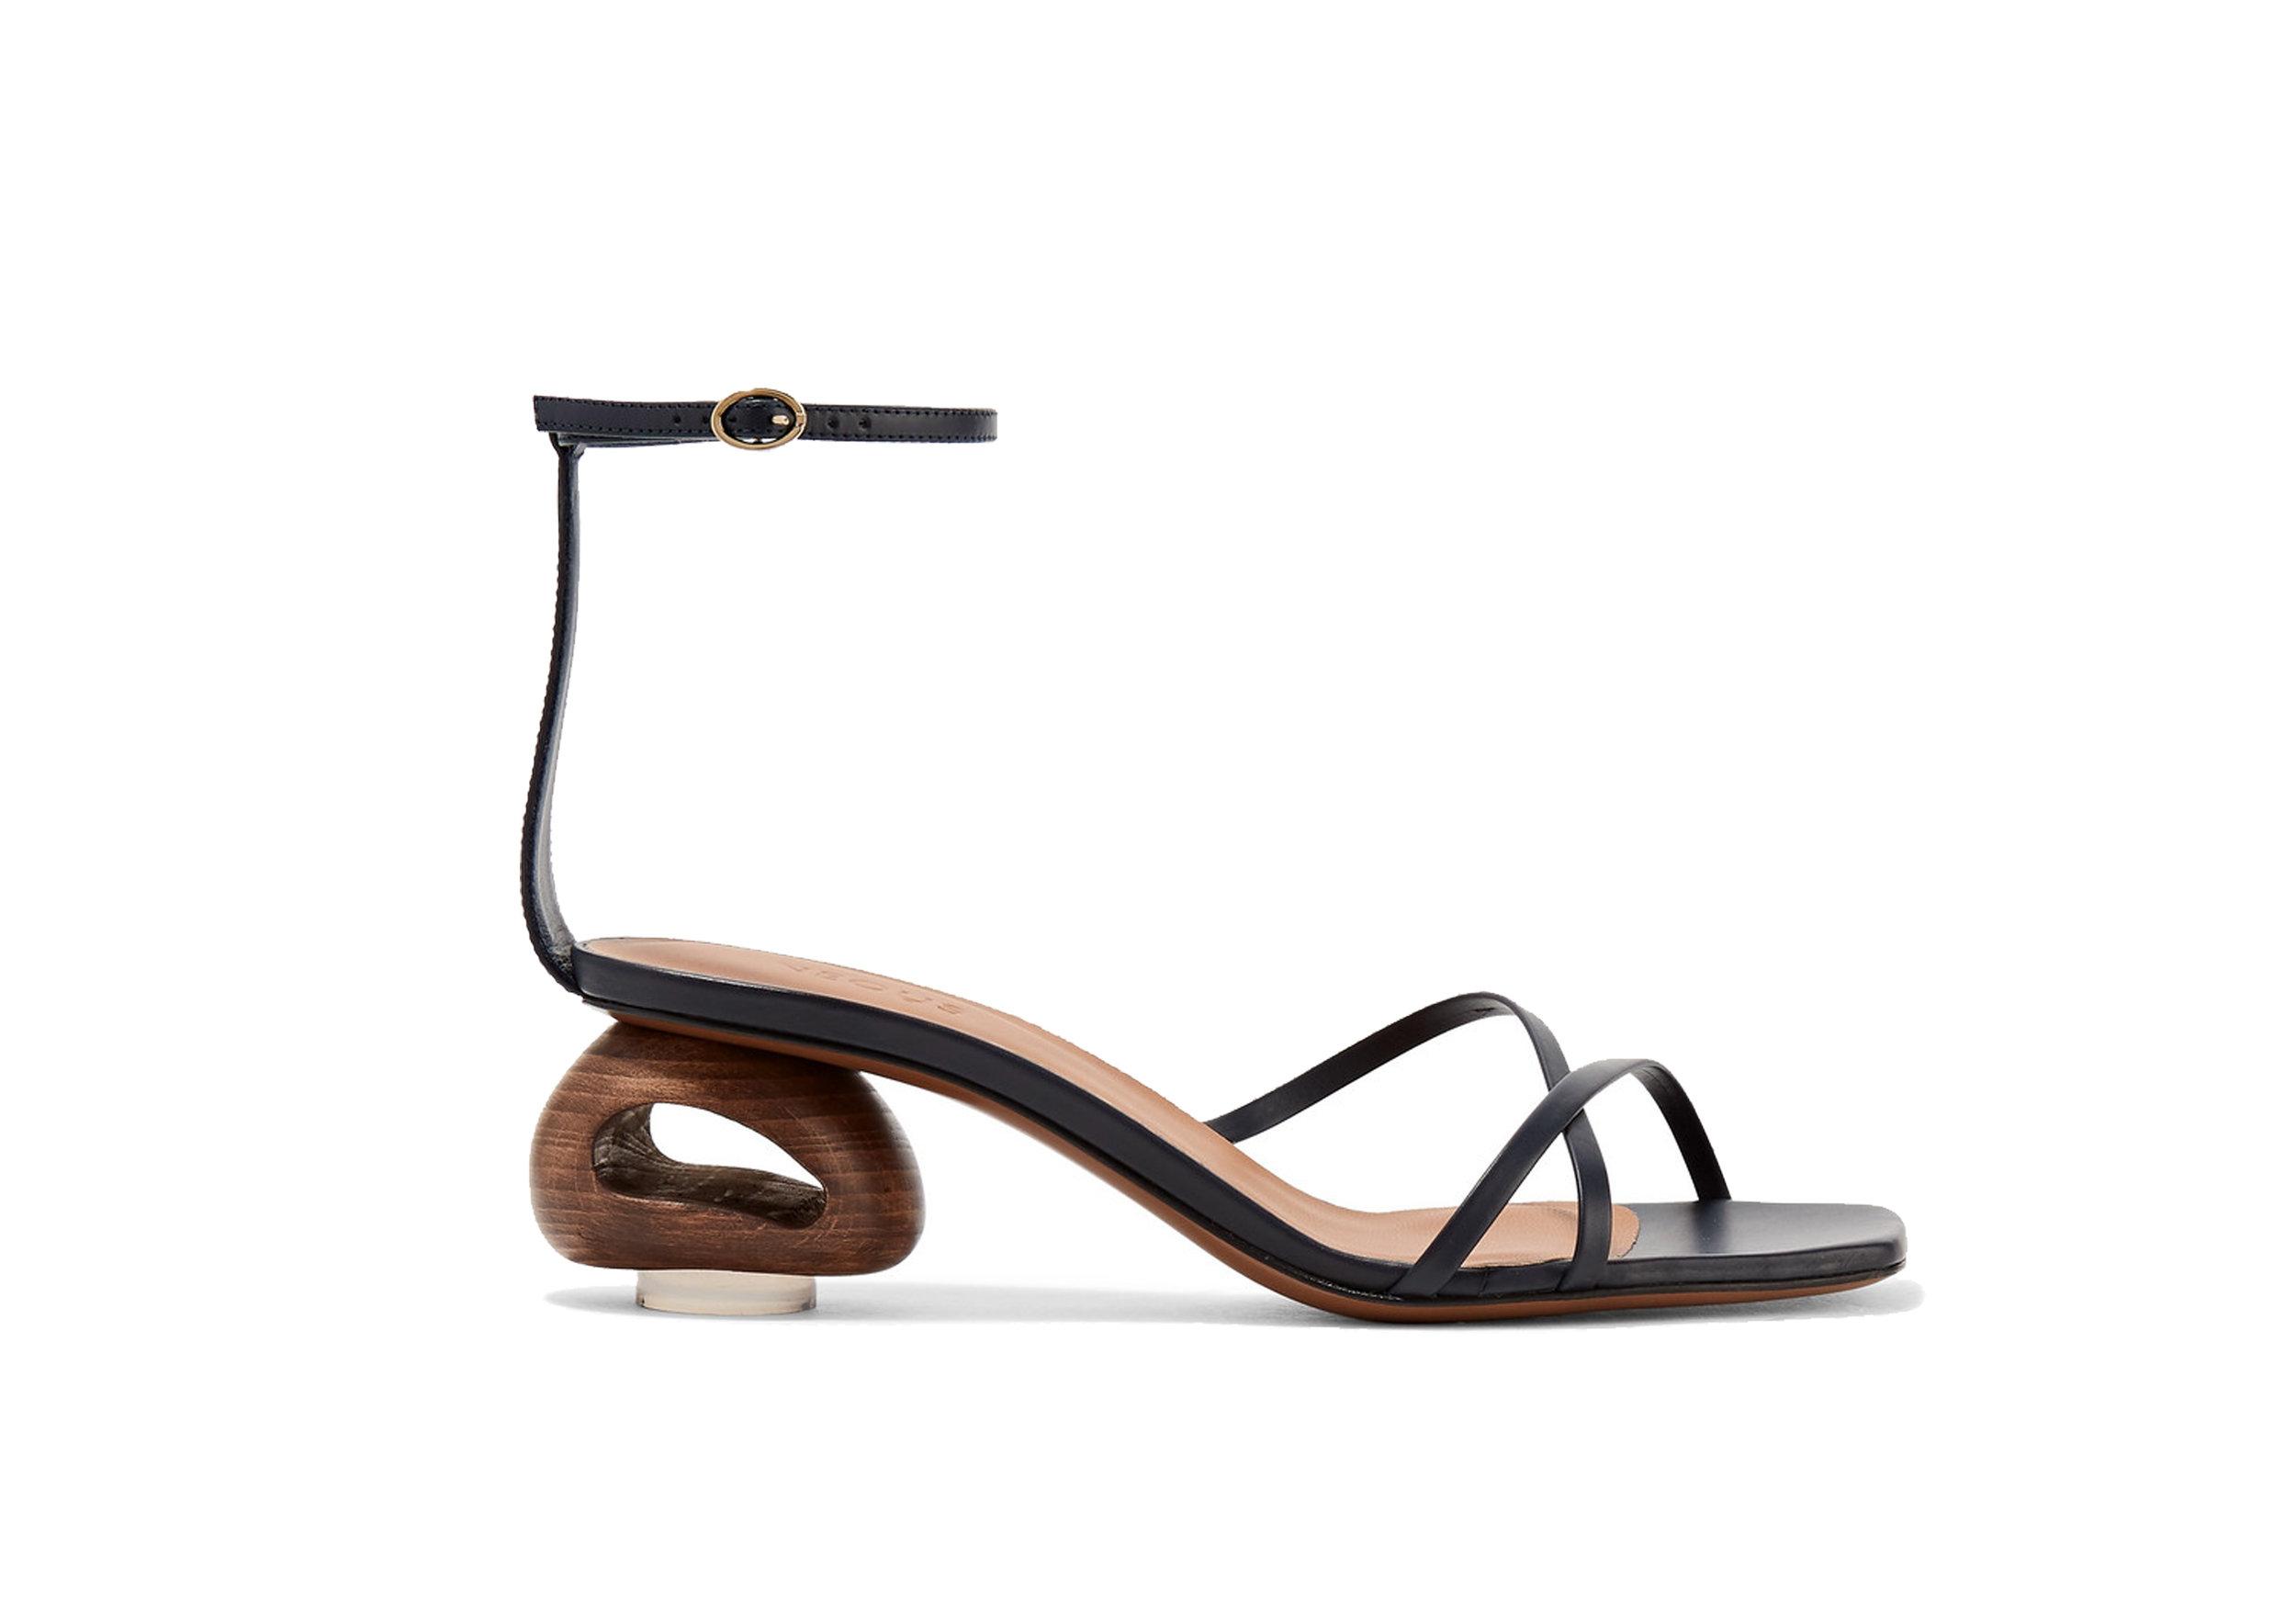 Neous - Phippium Leather Sandals, SGD 805